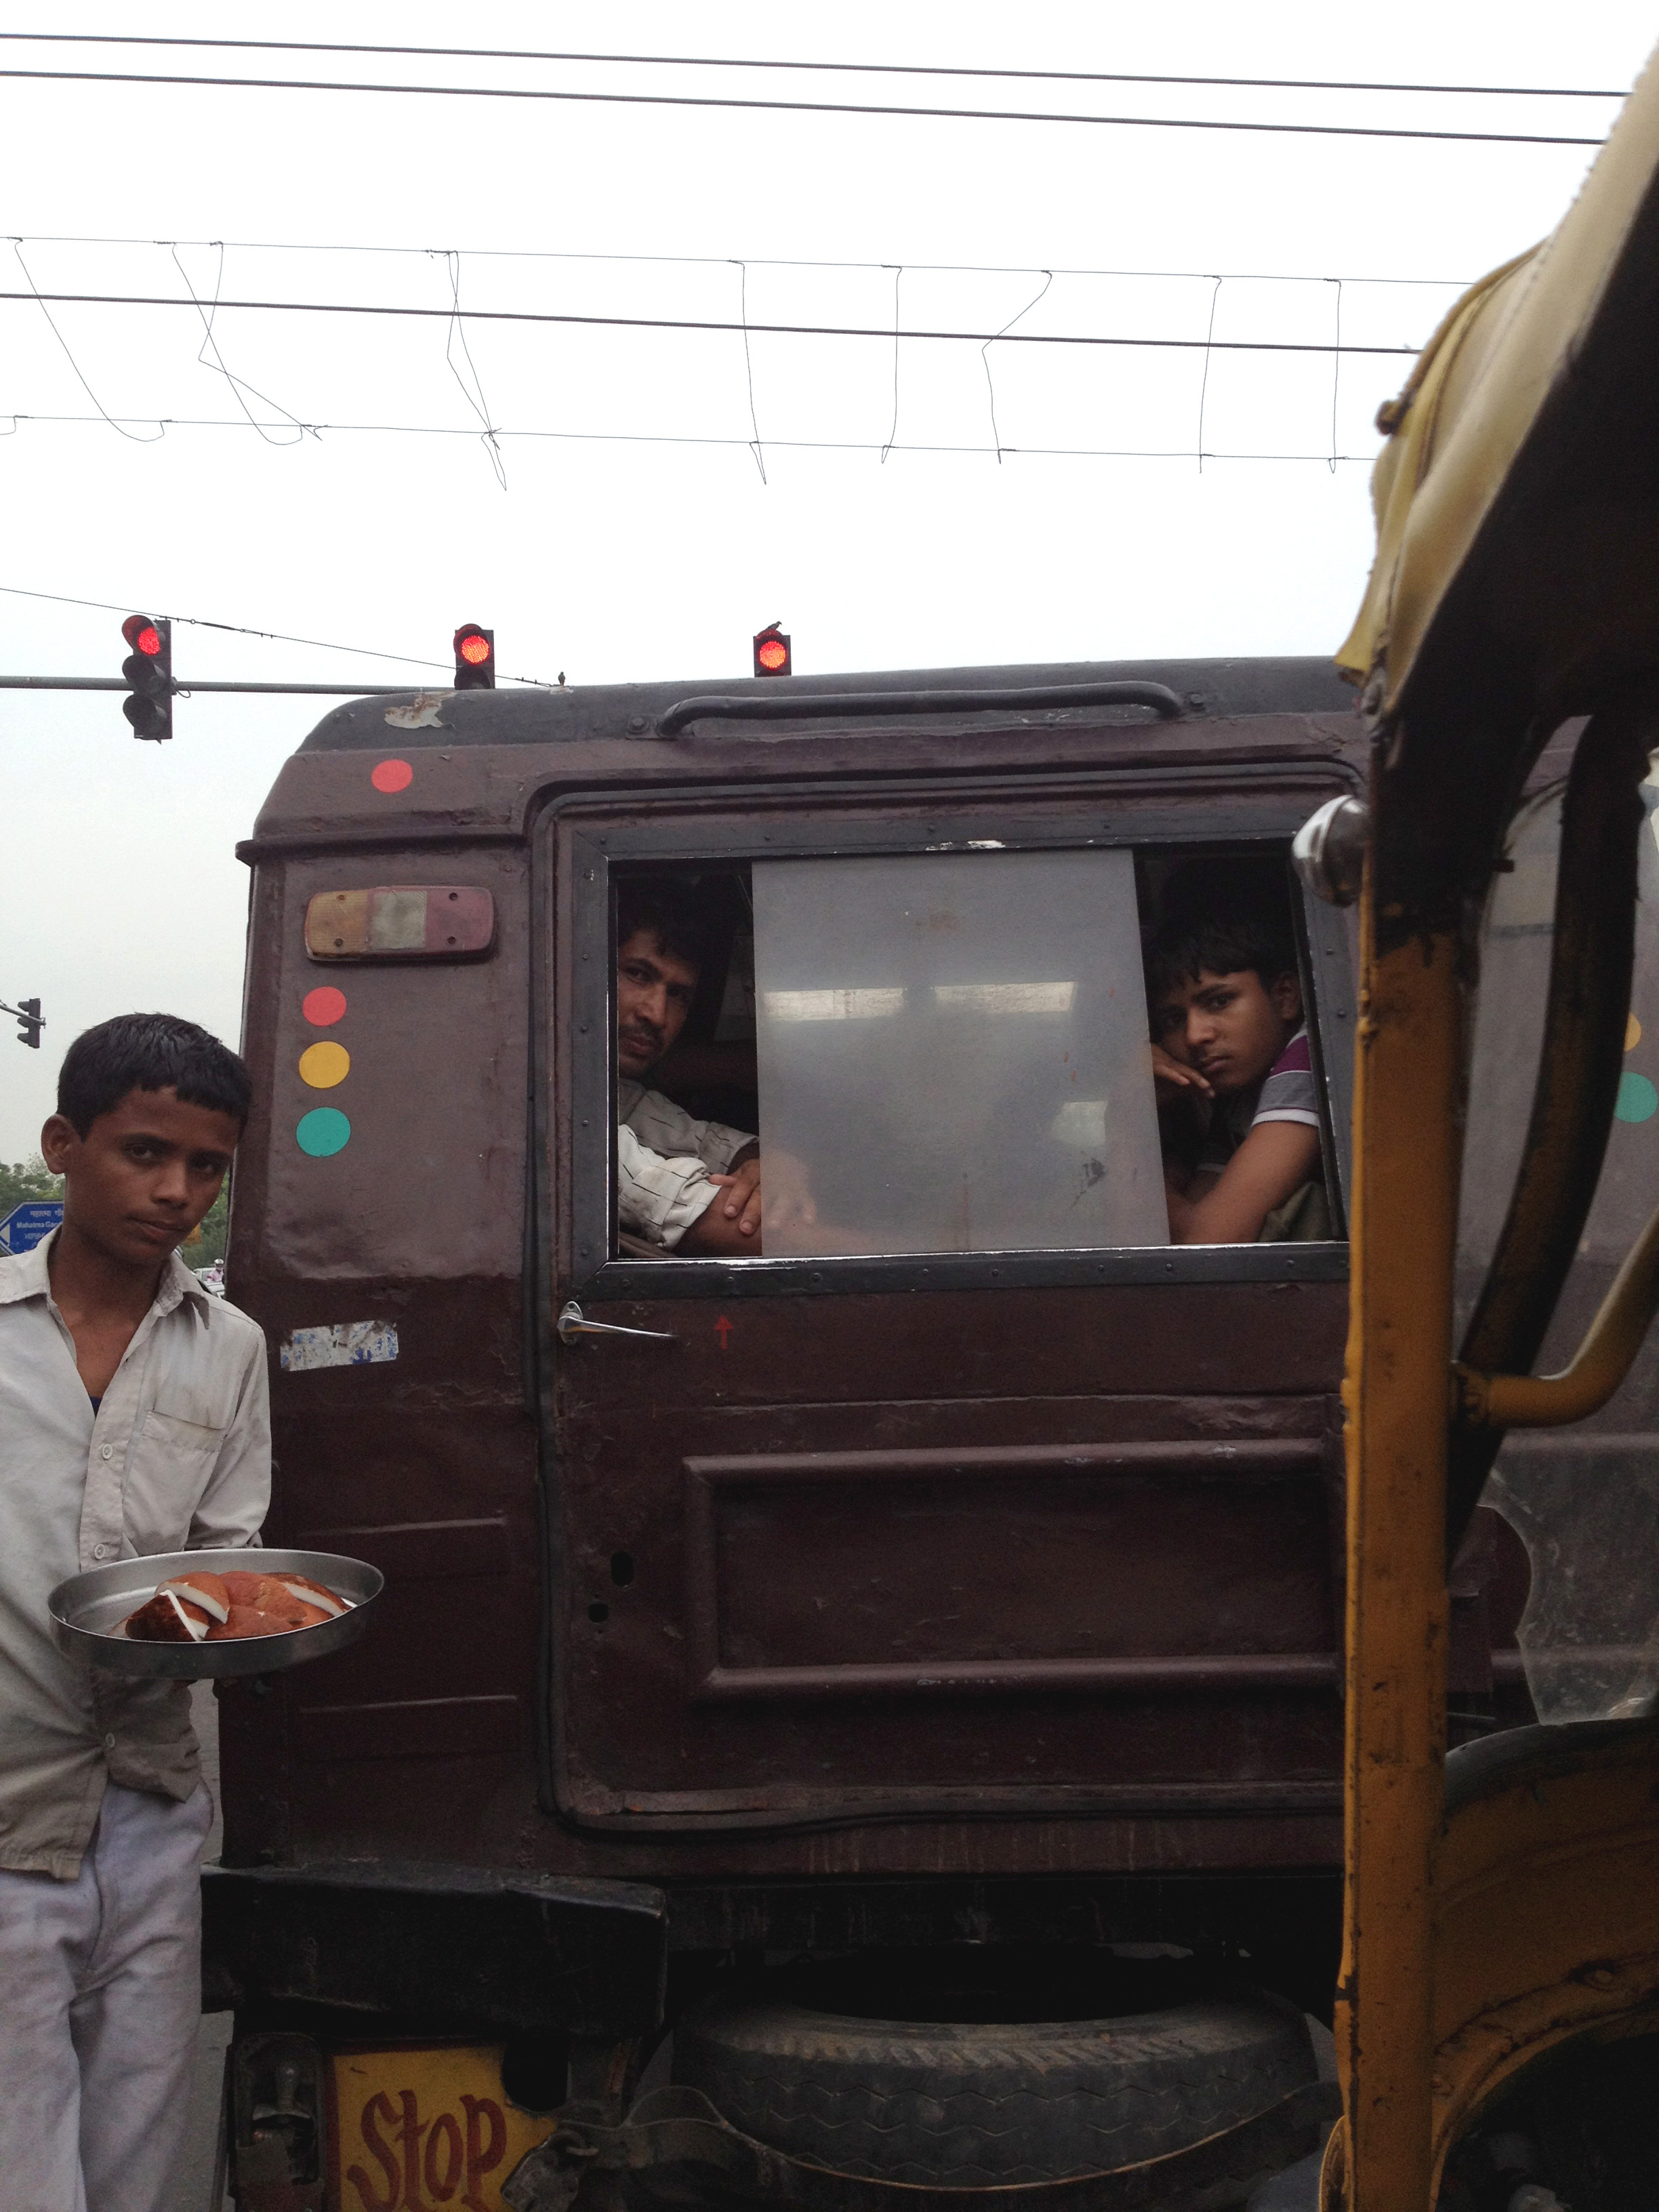 Intersection in New Delhi